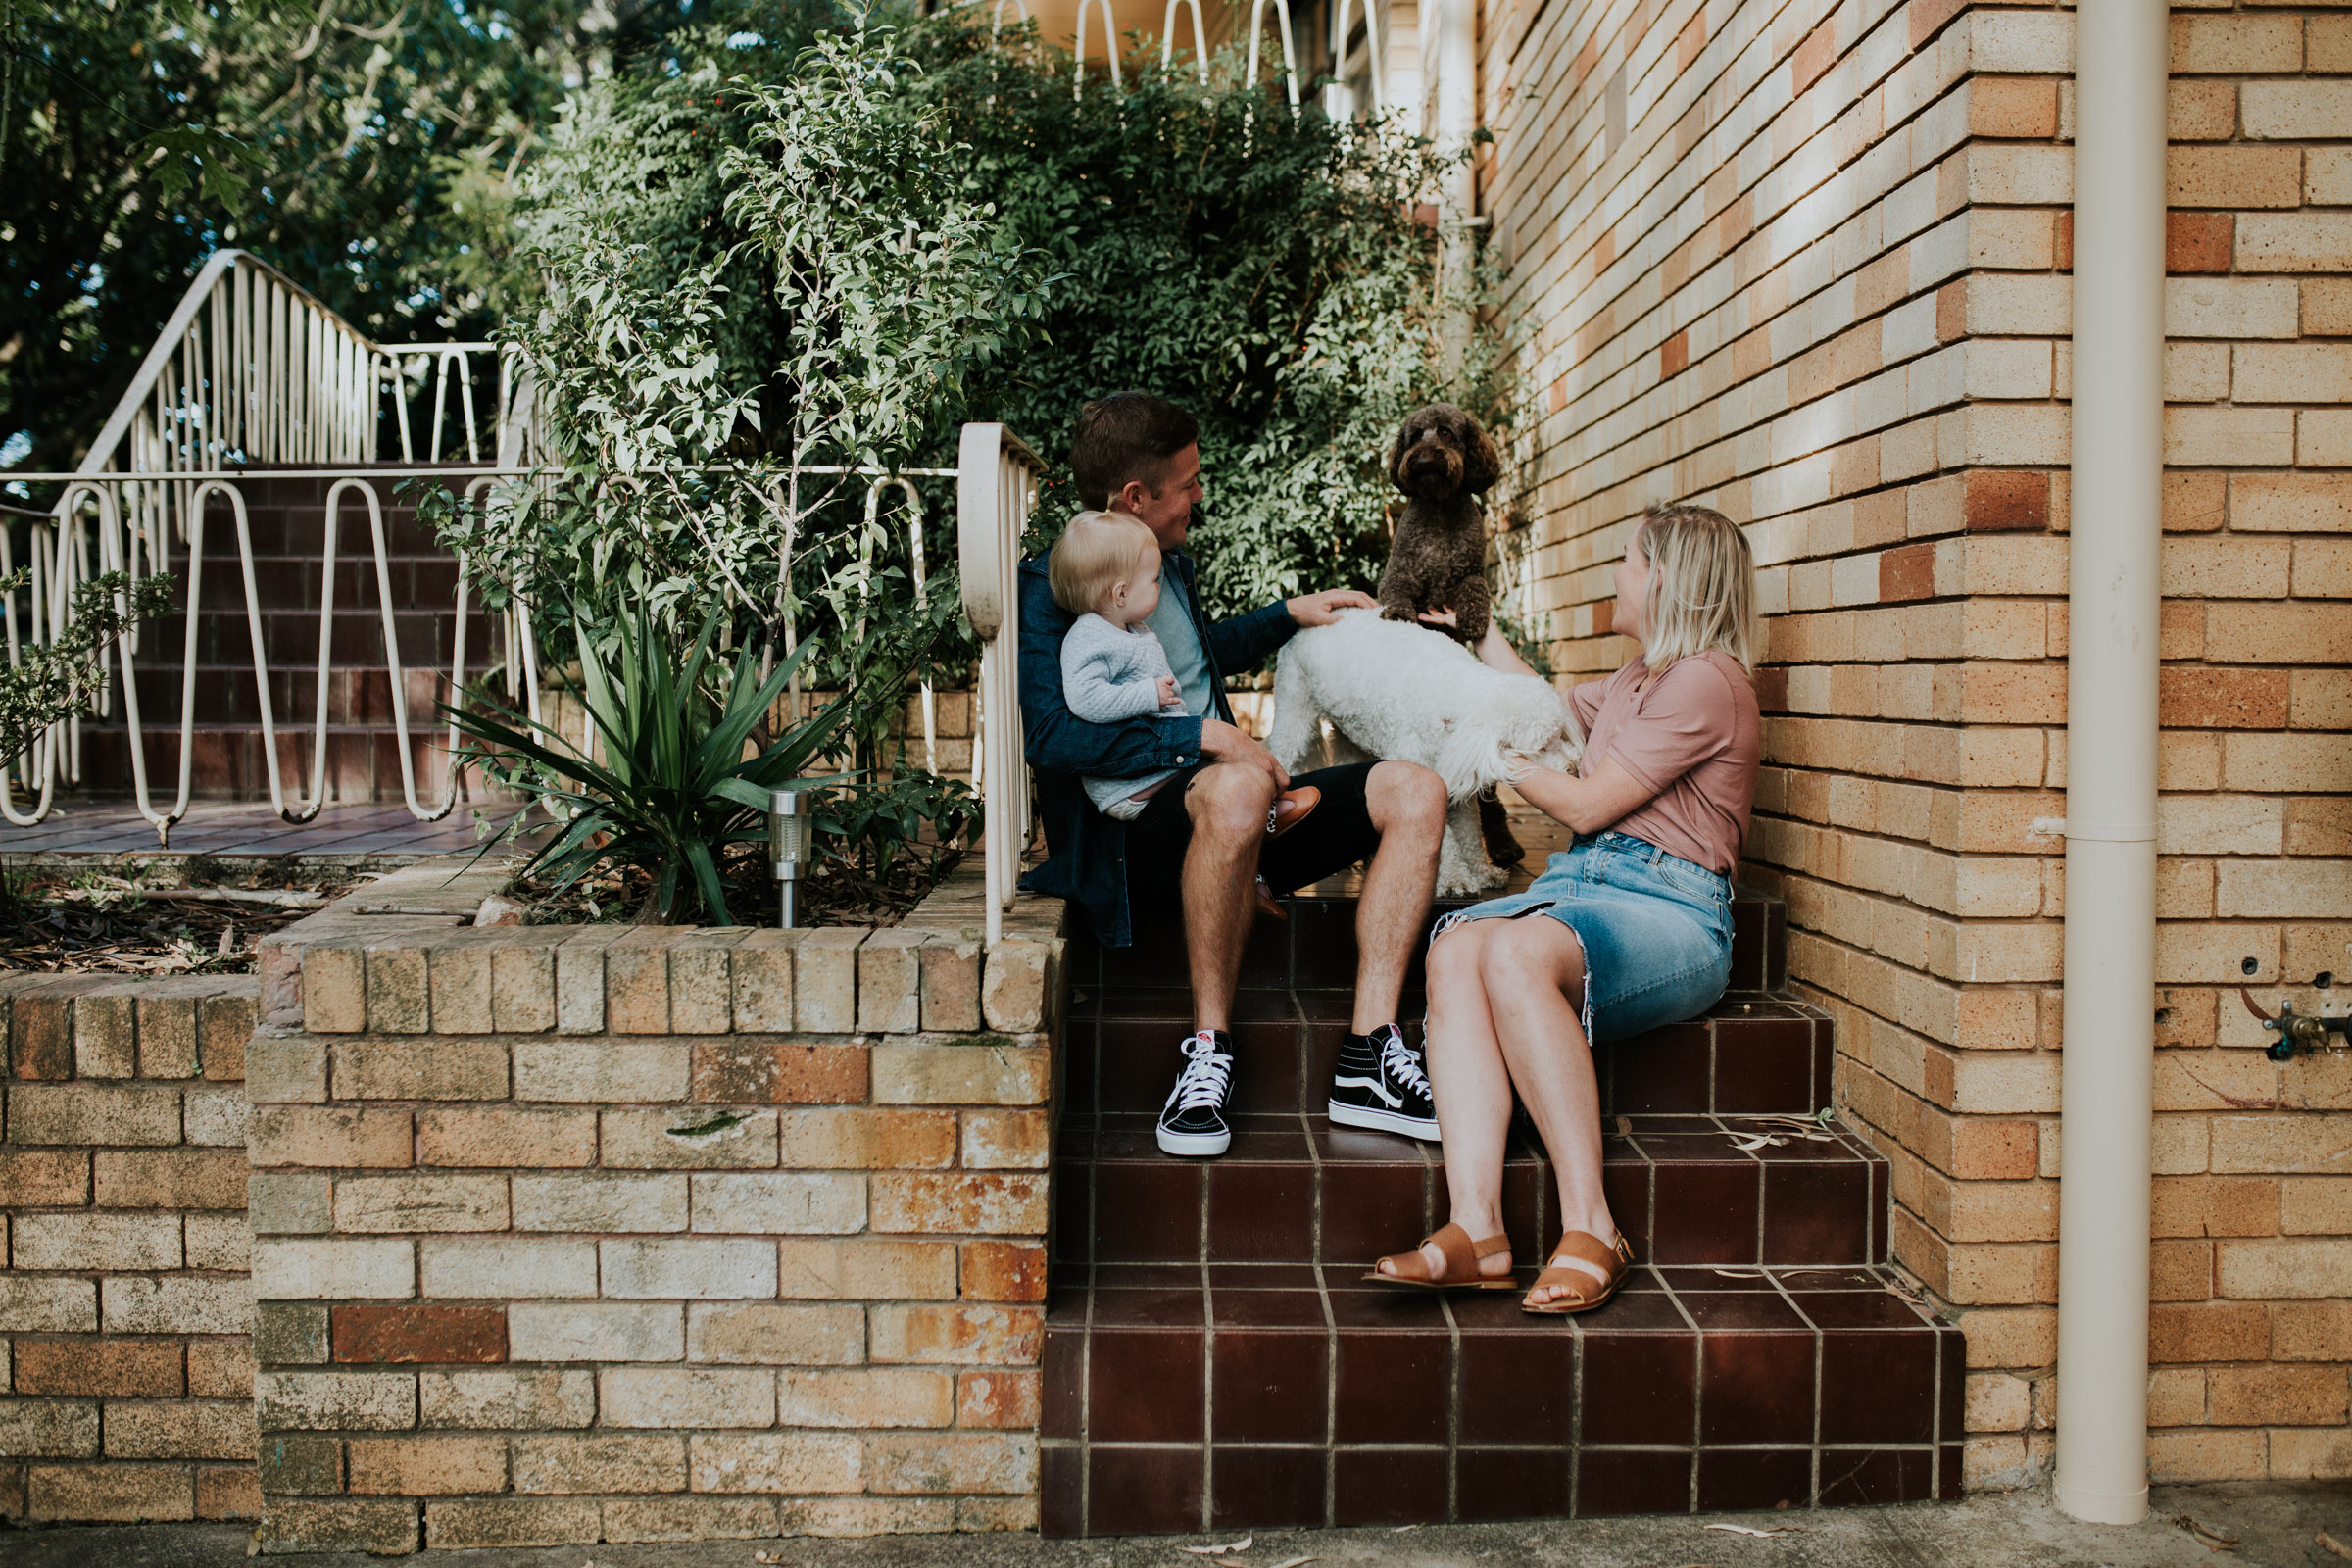 ROB+LOZ+ELKIE+KOCH+FAMILY+INHOME+LIFESTYLE+SESSION-48.jpg